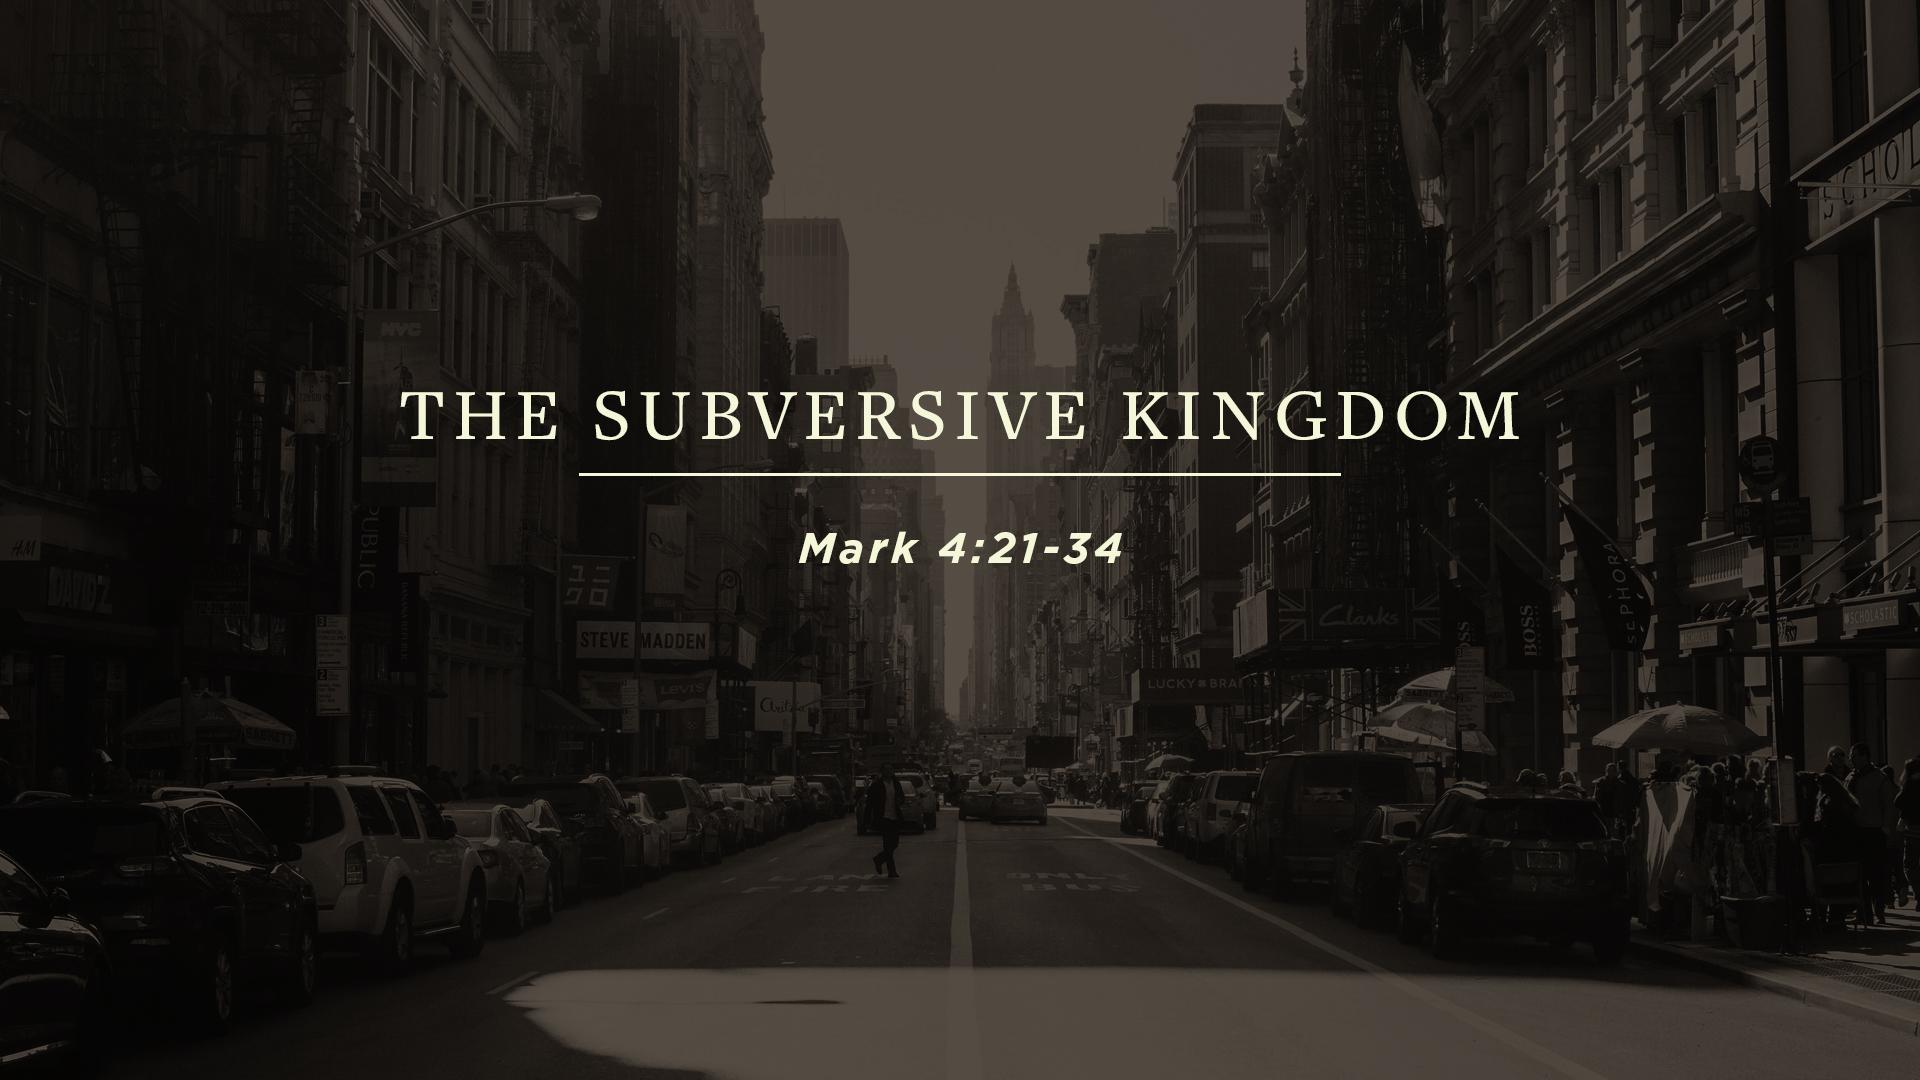 The Subversive Kingdom